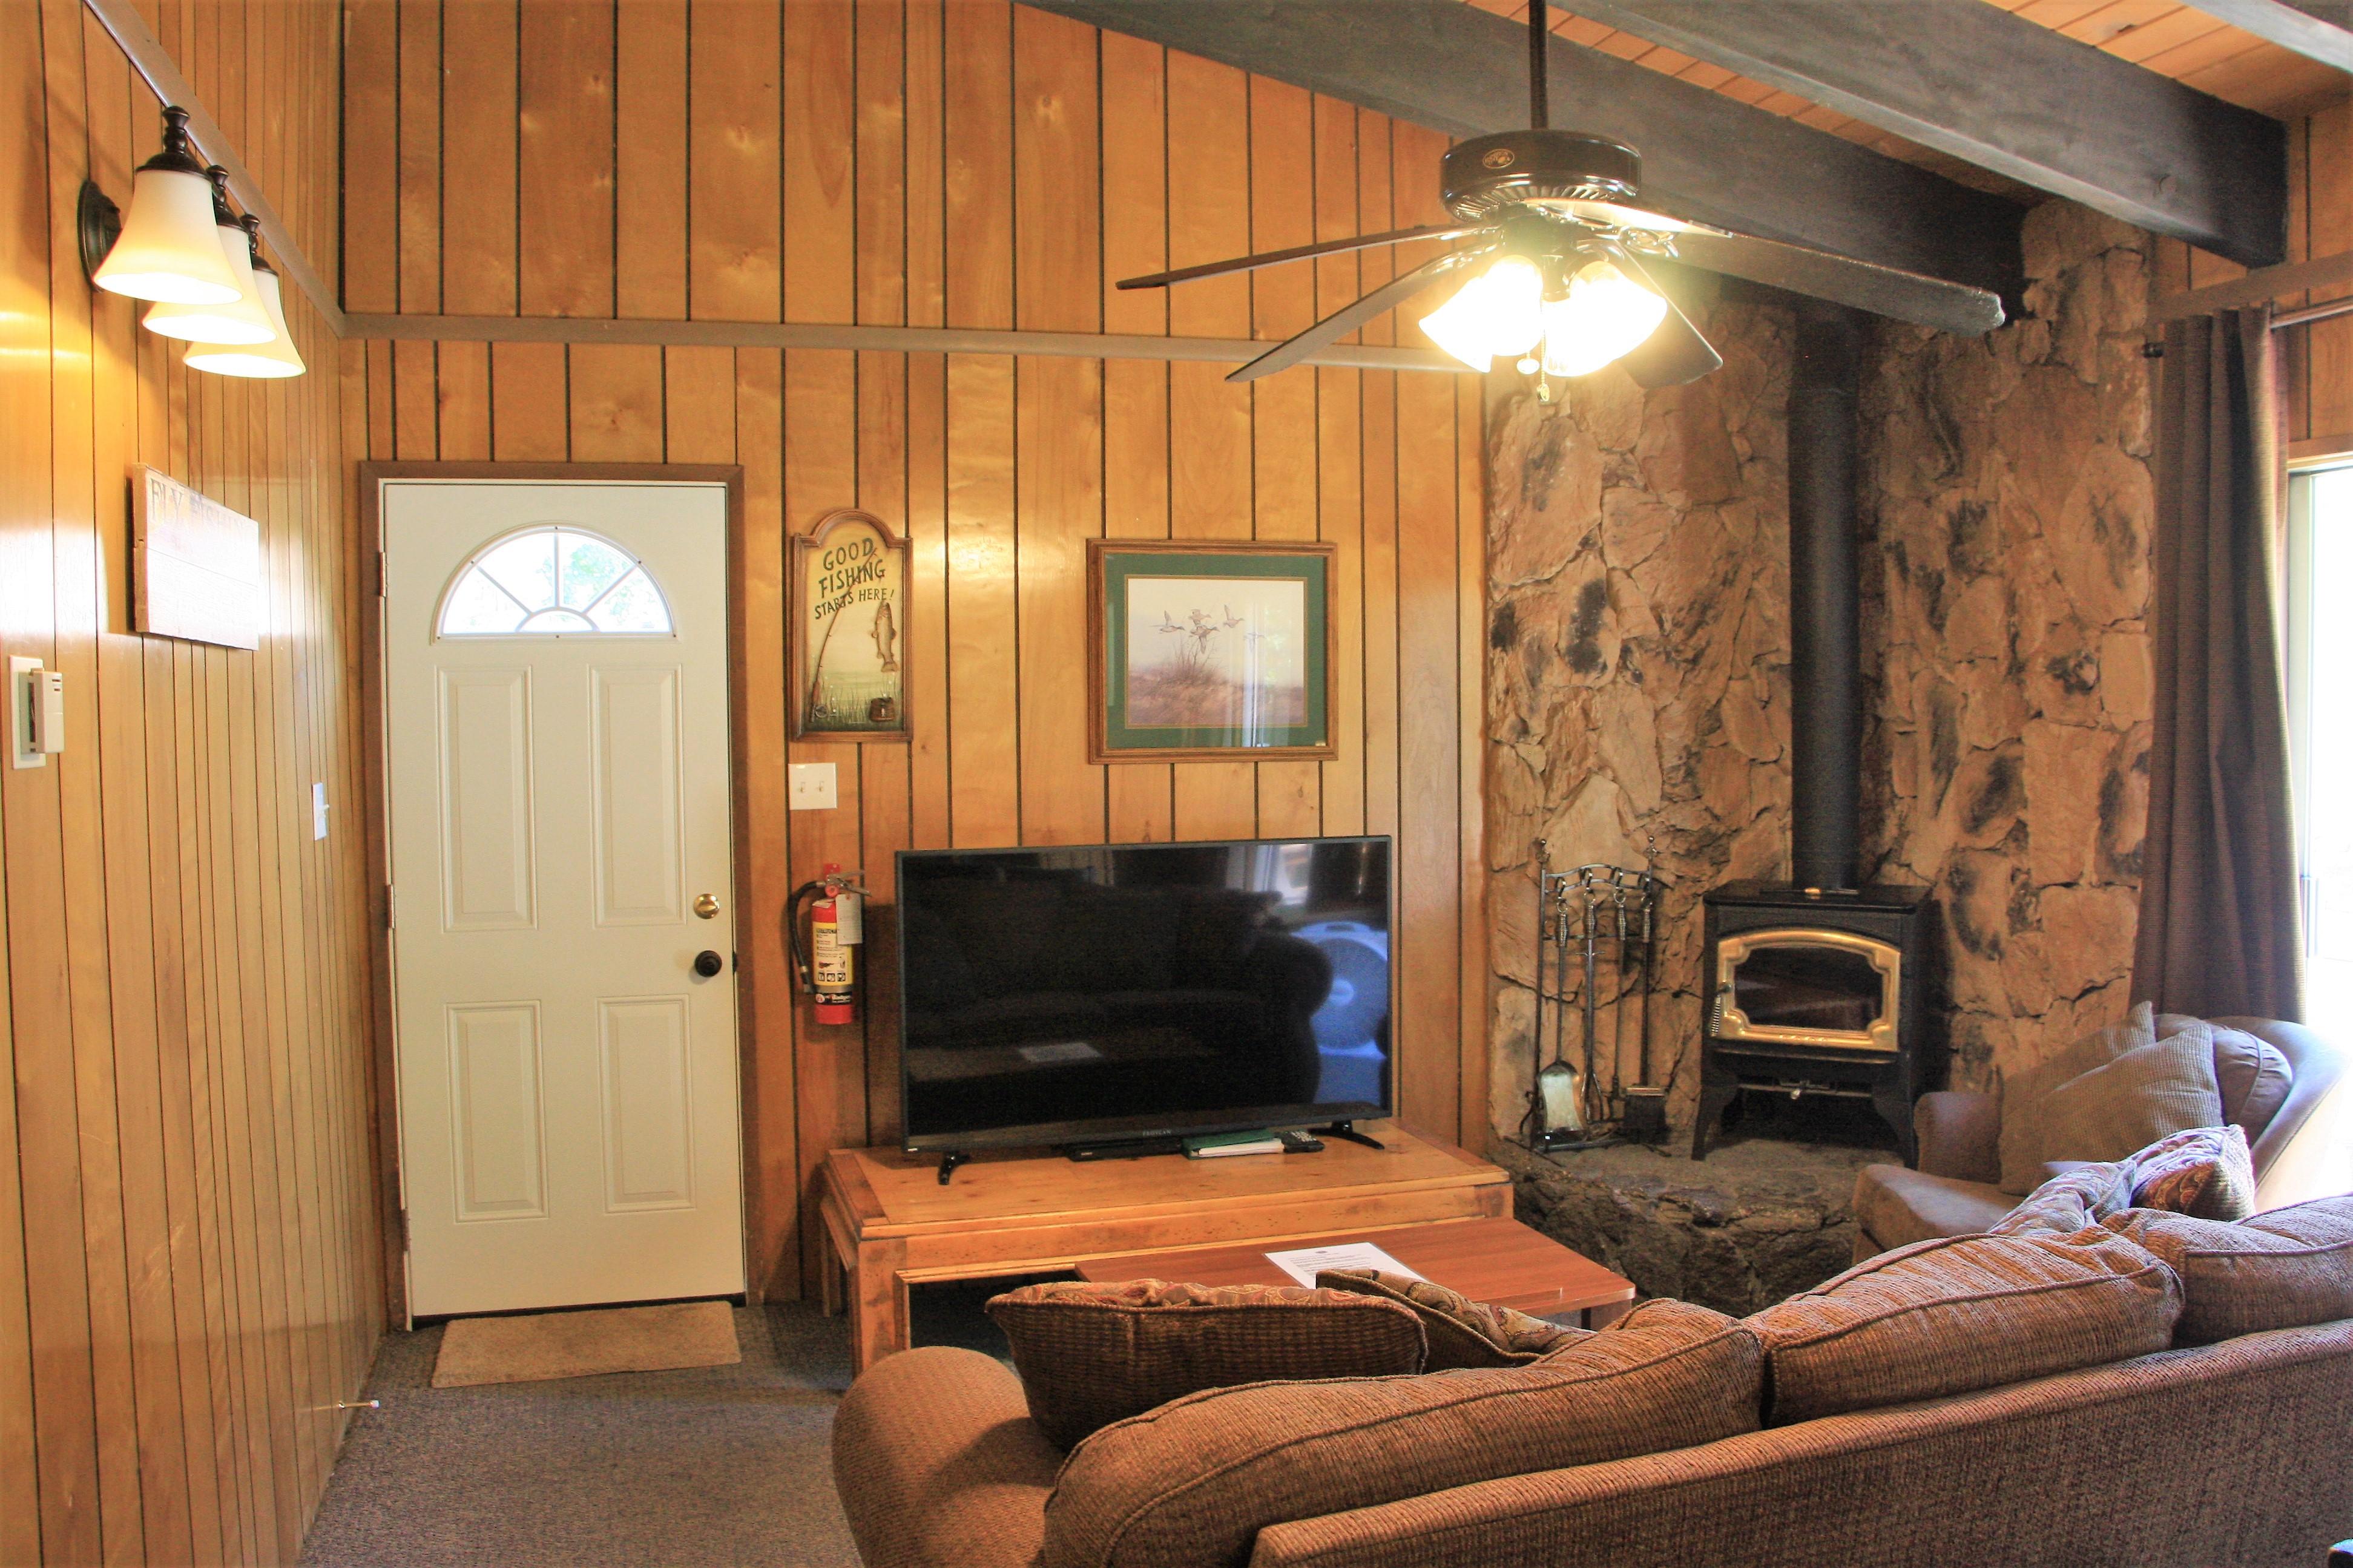 Audubon living room